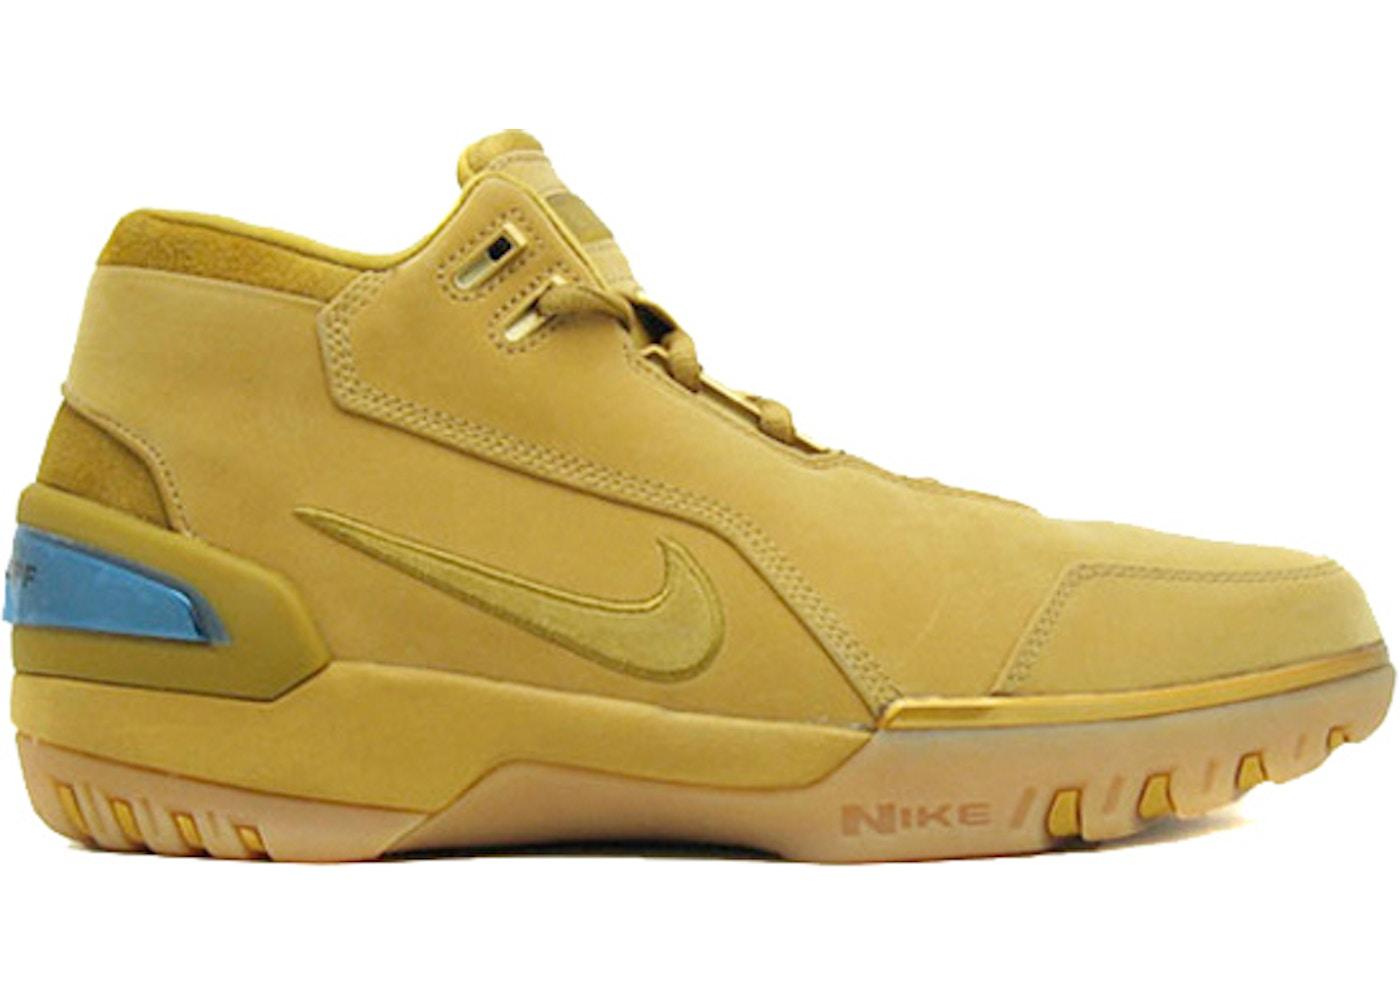 9739e96fc52 Buy Nike LeBron Shoes   Deadstock Sneakers